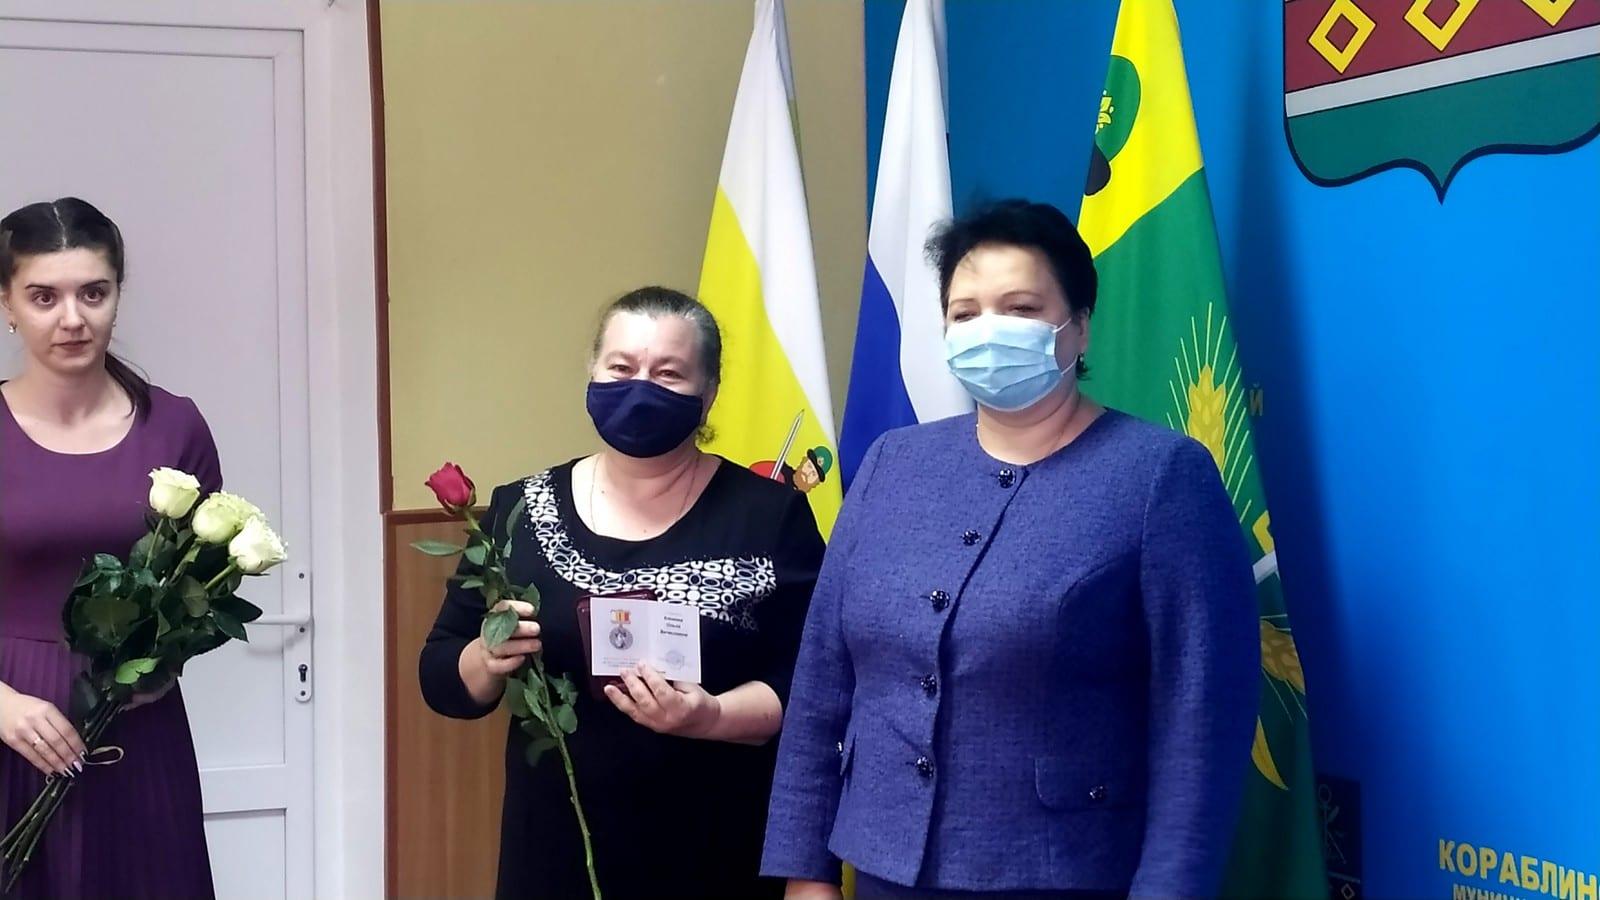 Елена Митина встретилась с педагогами Кораблинского района